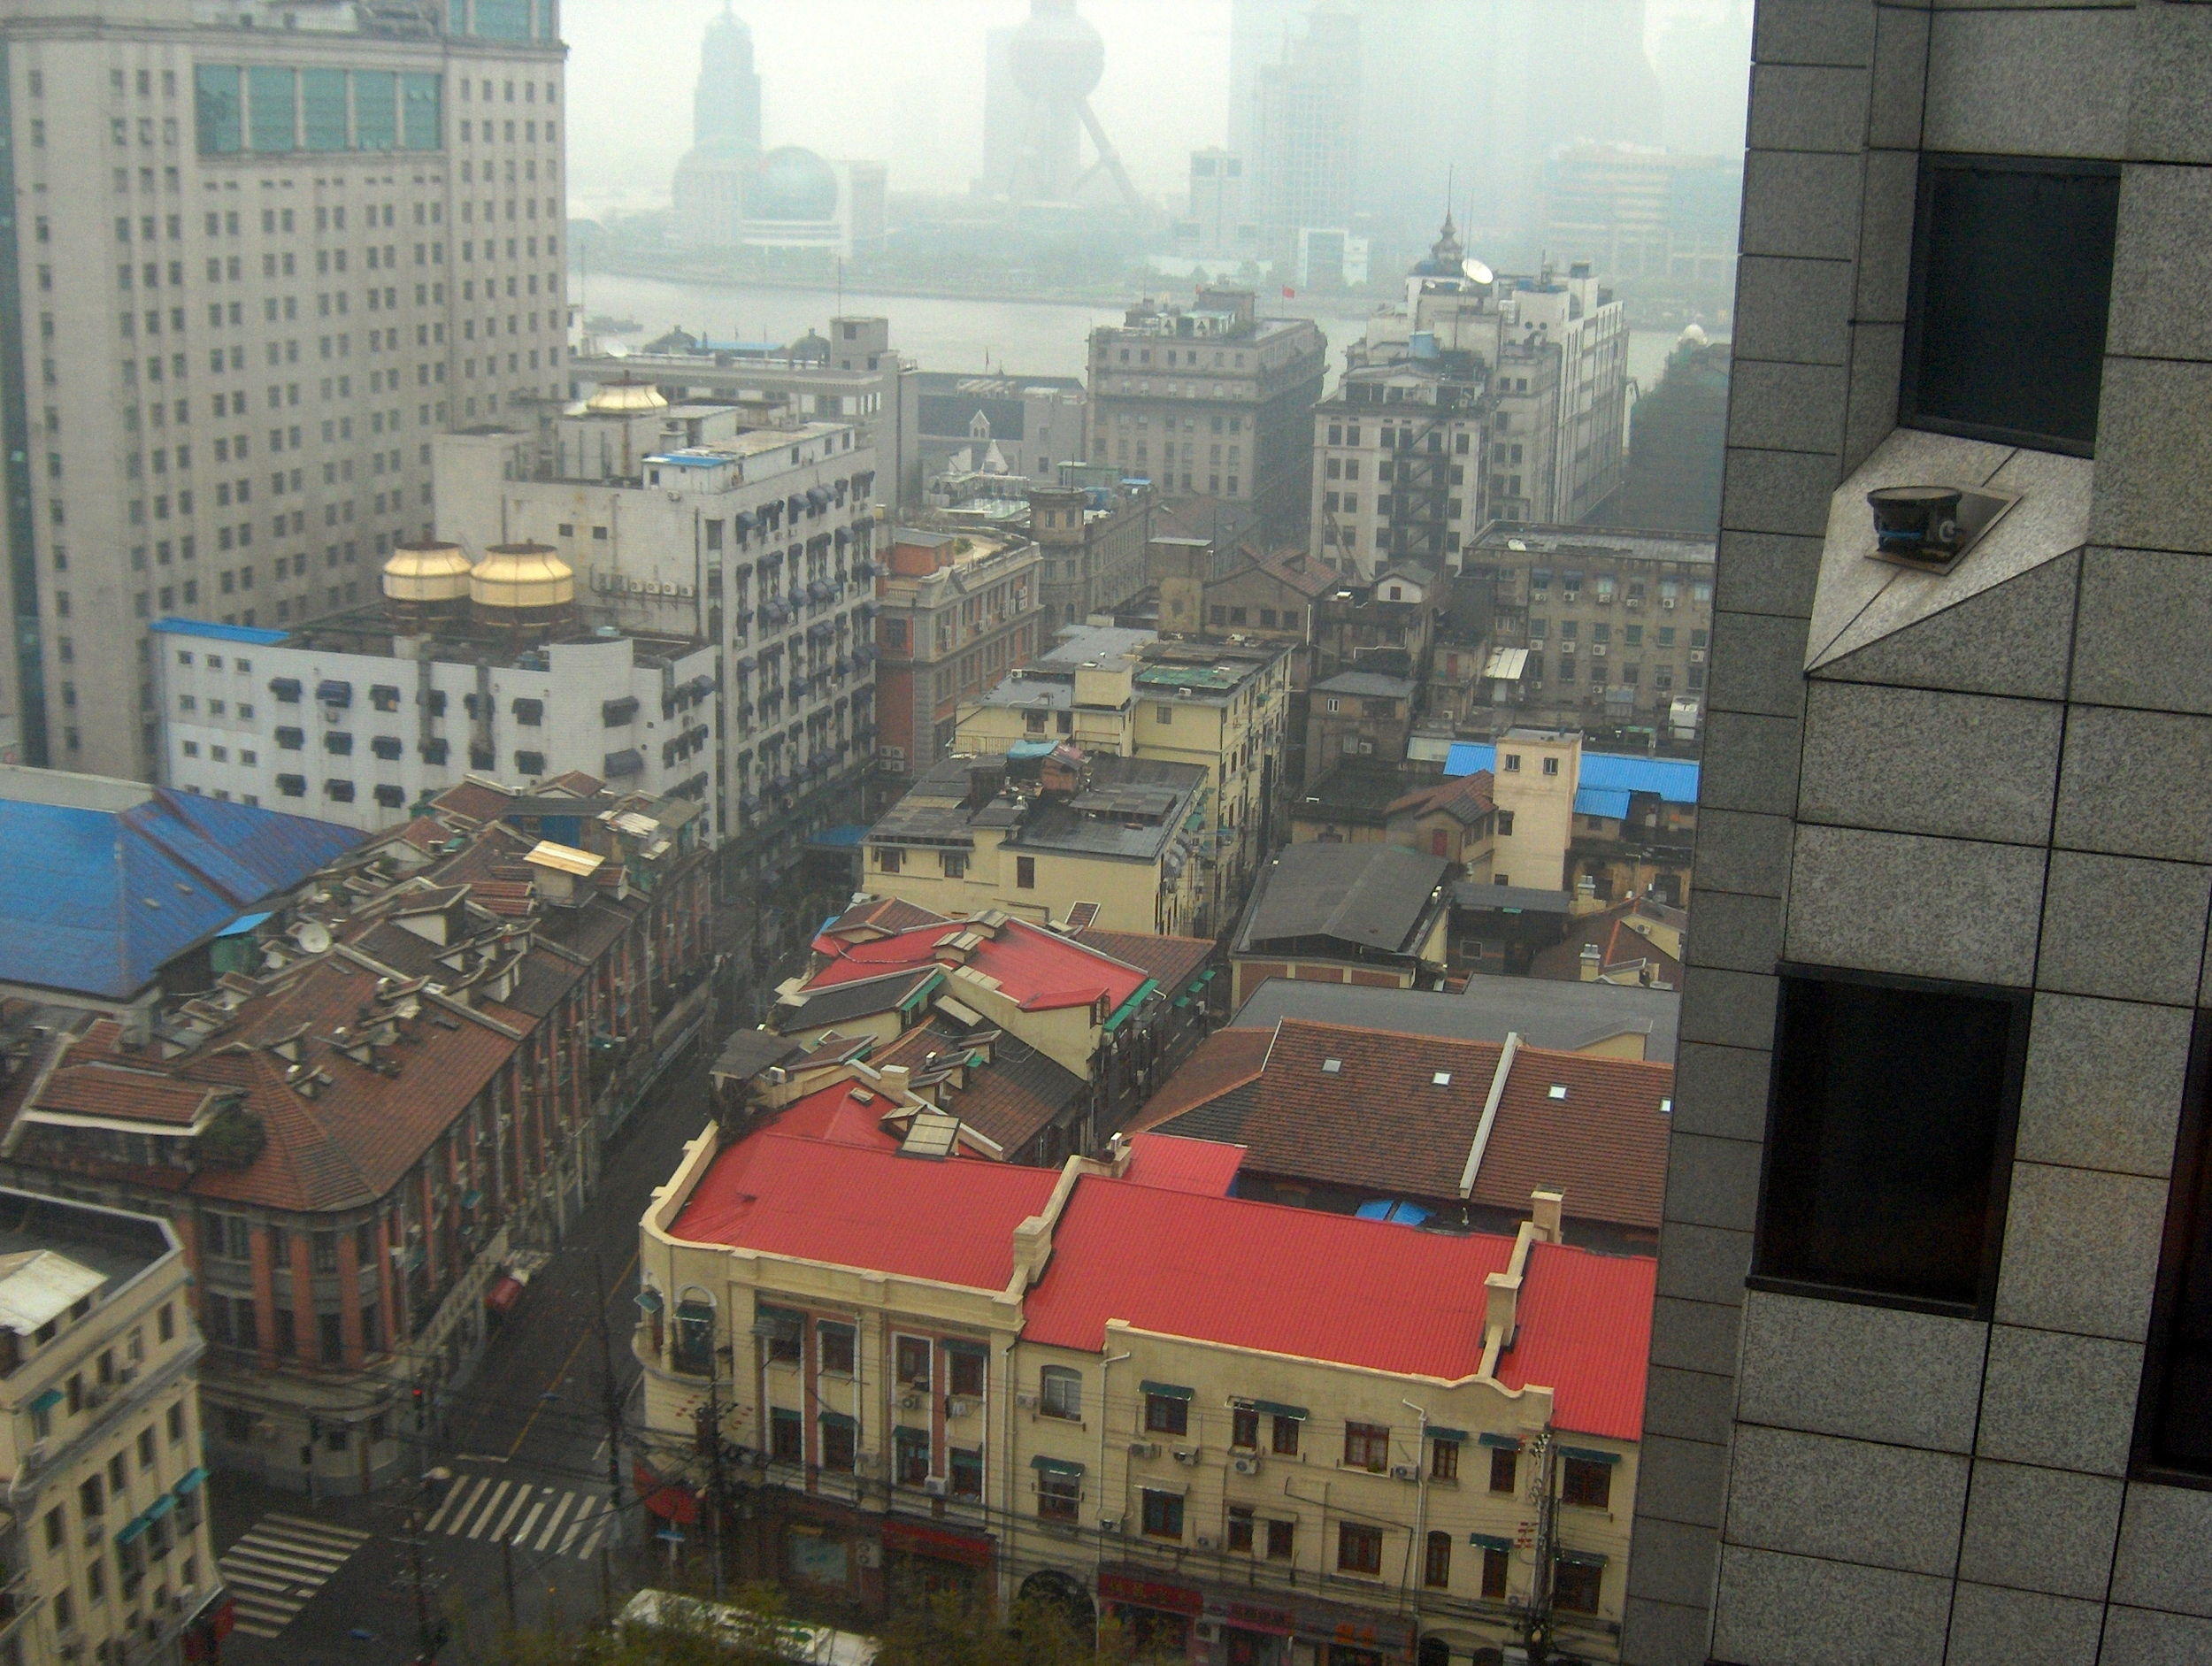 Shanghai Fog/Smog